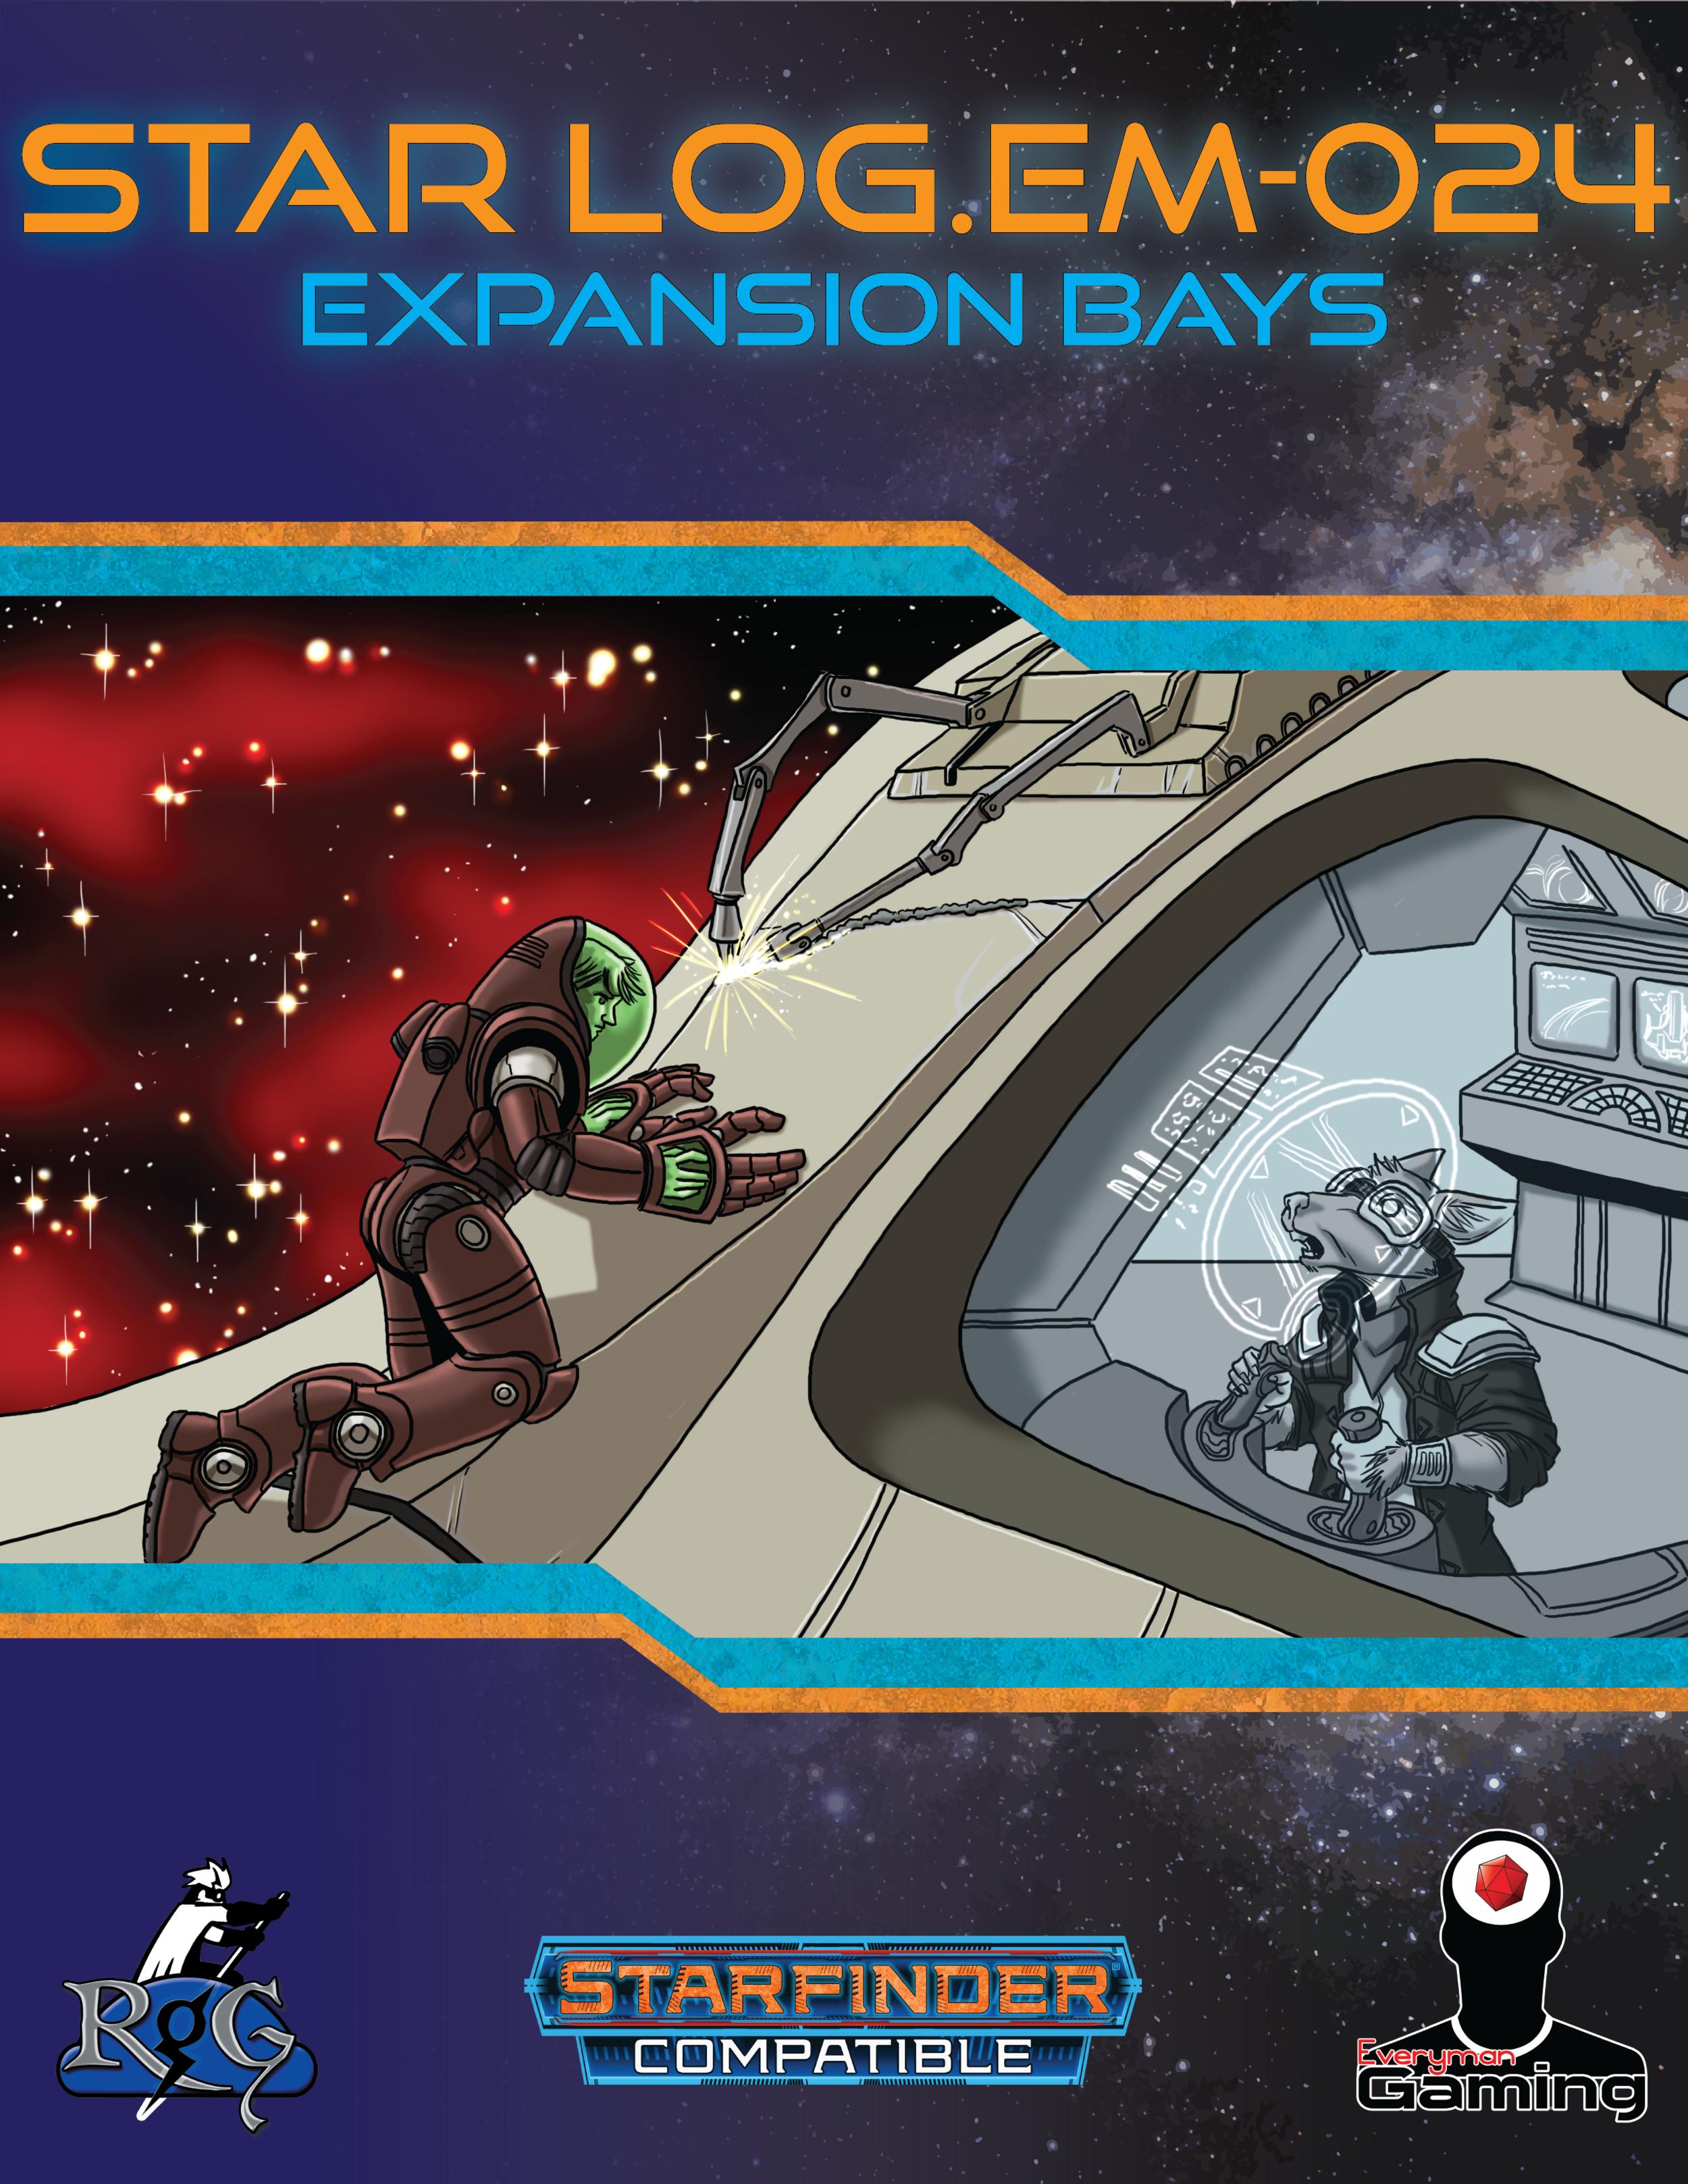 SF024 Starship Expansion Bays.png